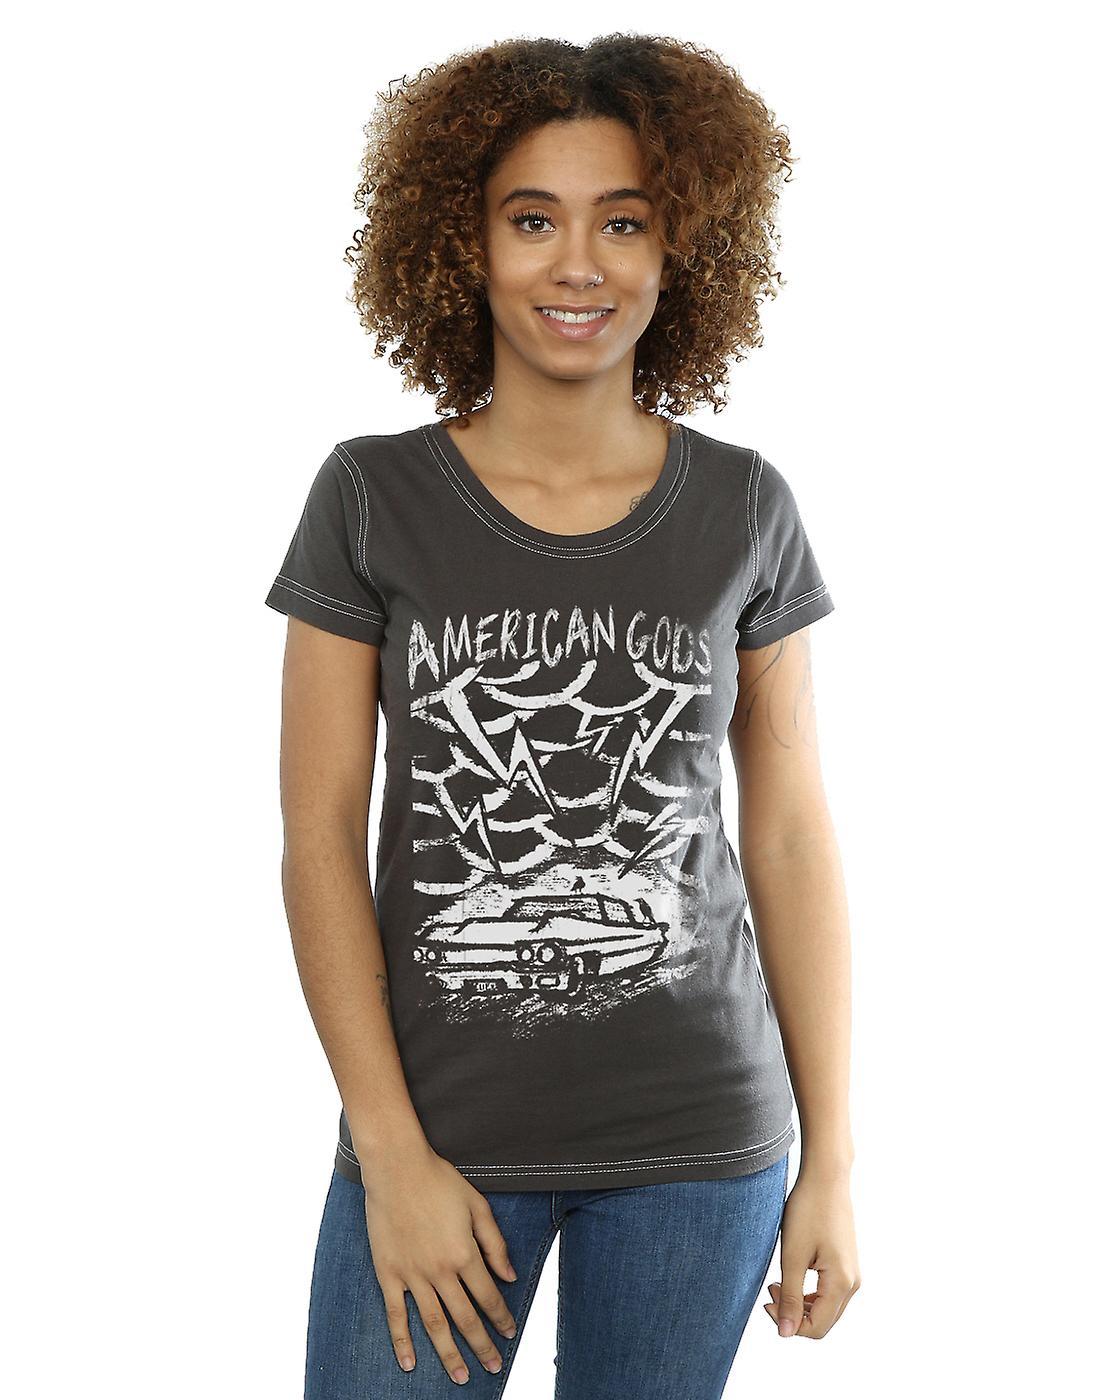 Aftershow Women's American Gods Storm T-Shirt